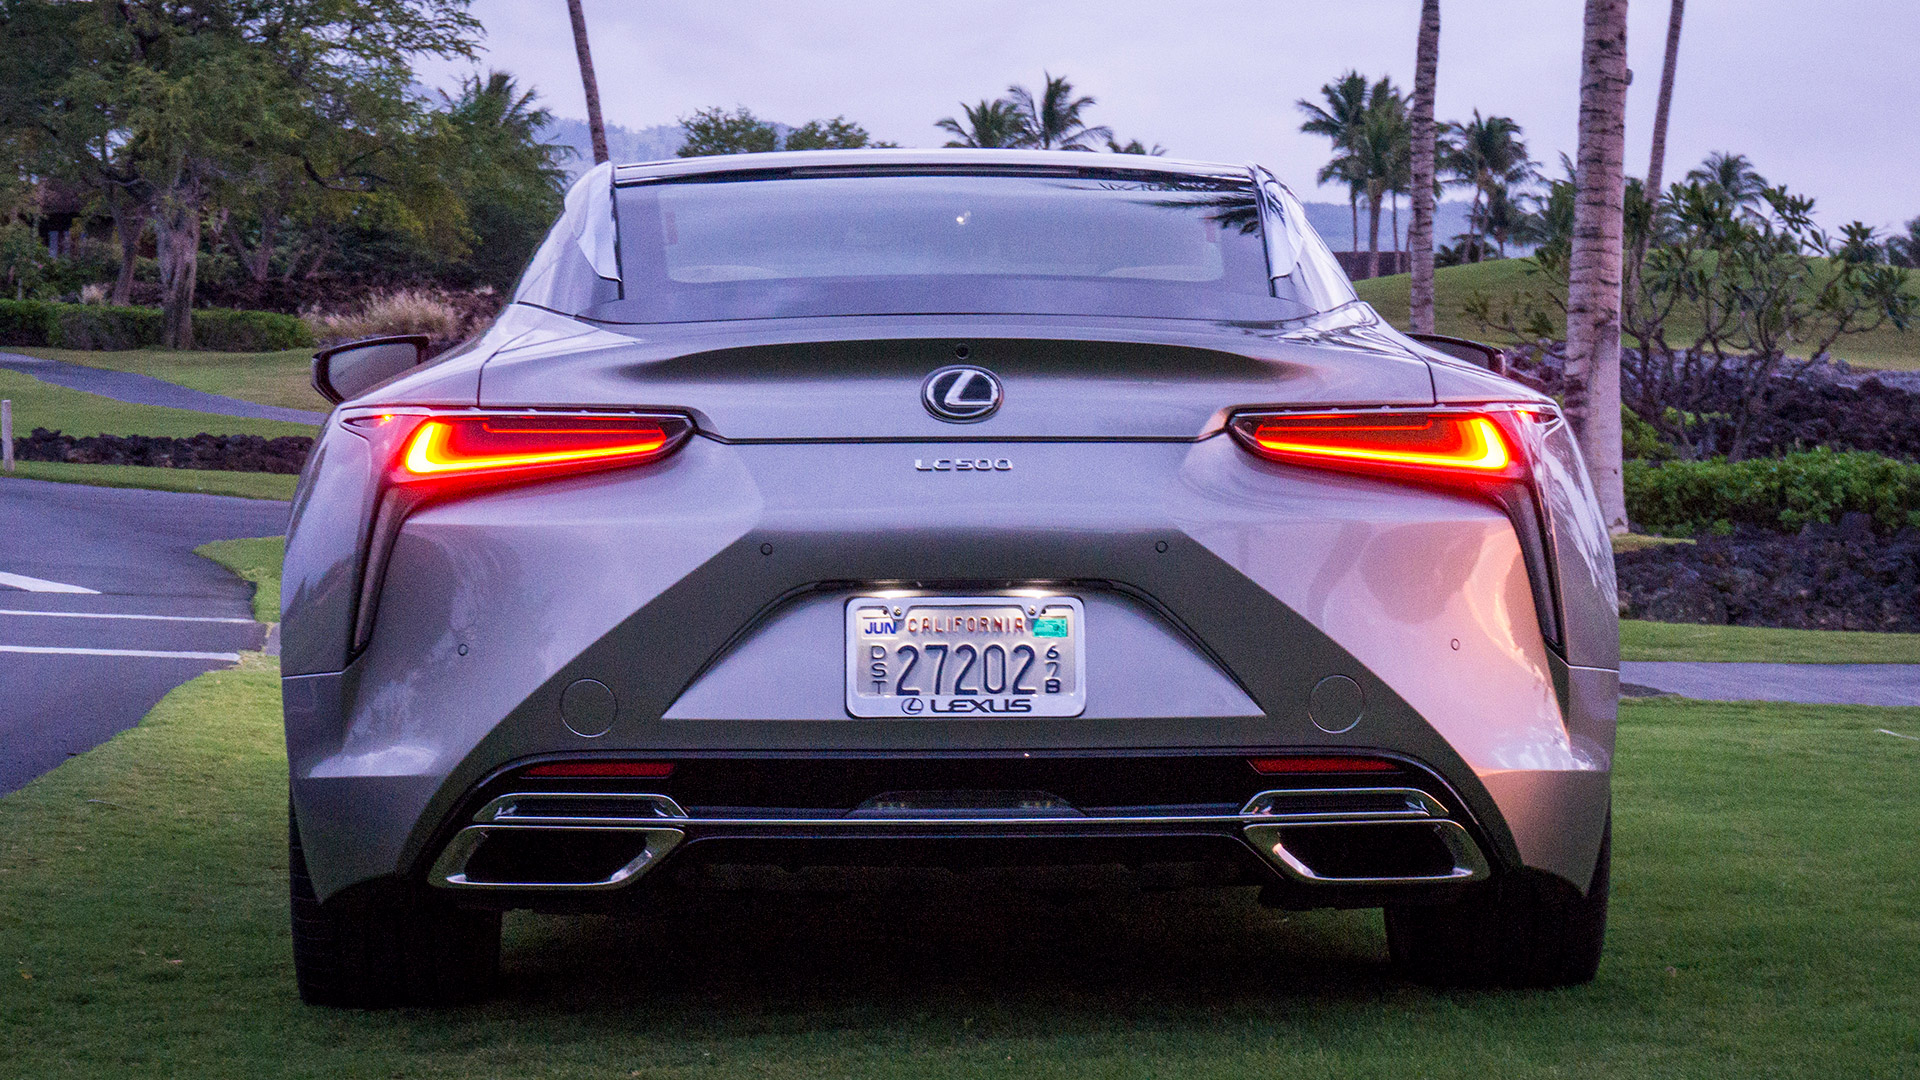 2018 Lexus LC 500 Lexus Moves Into the Fast Lane 95 Octane